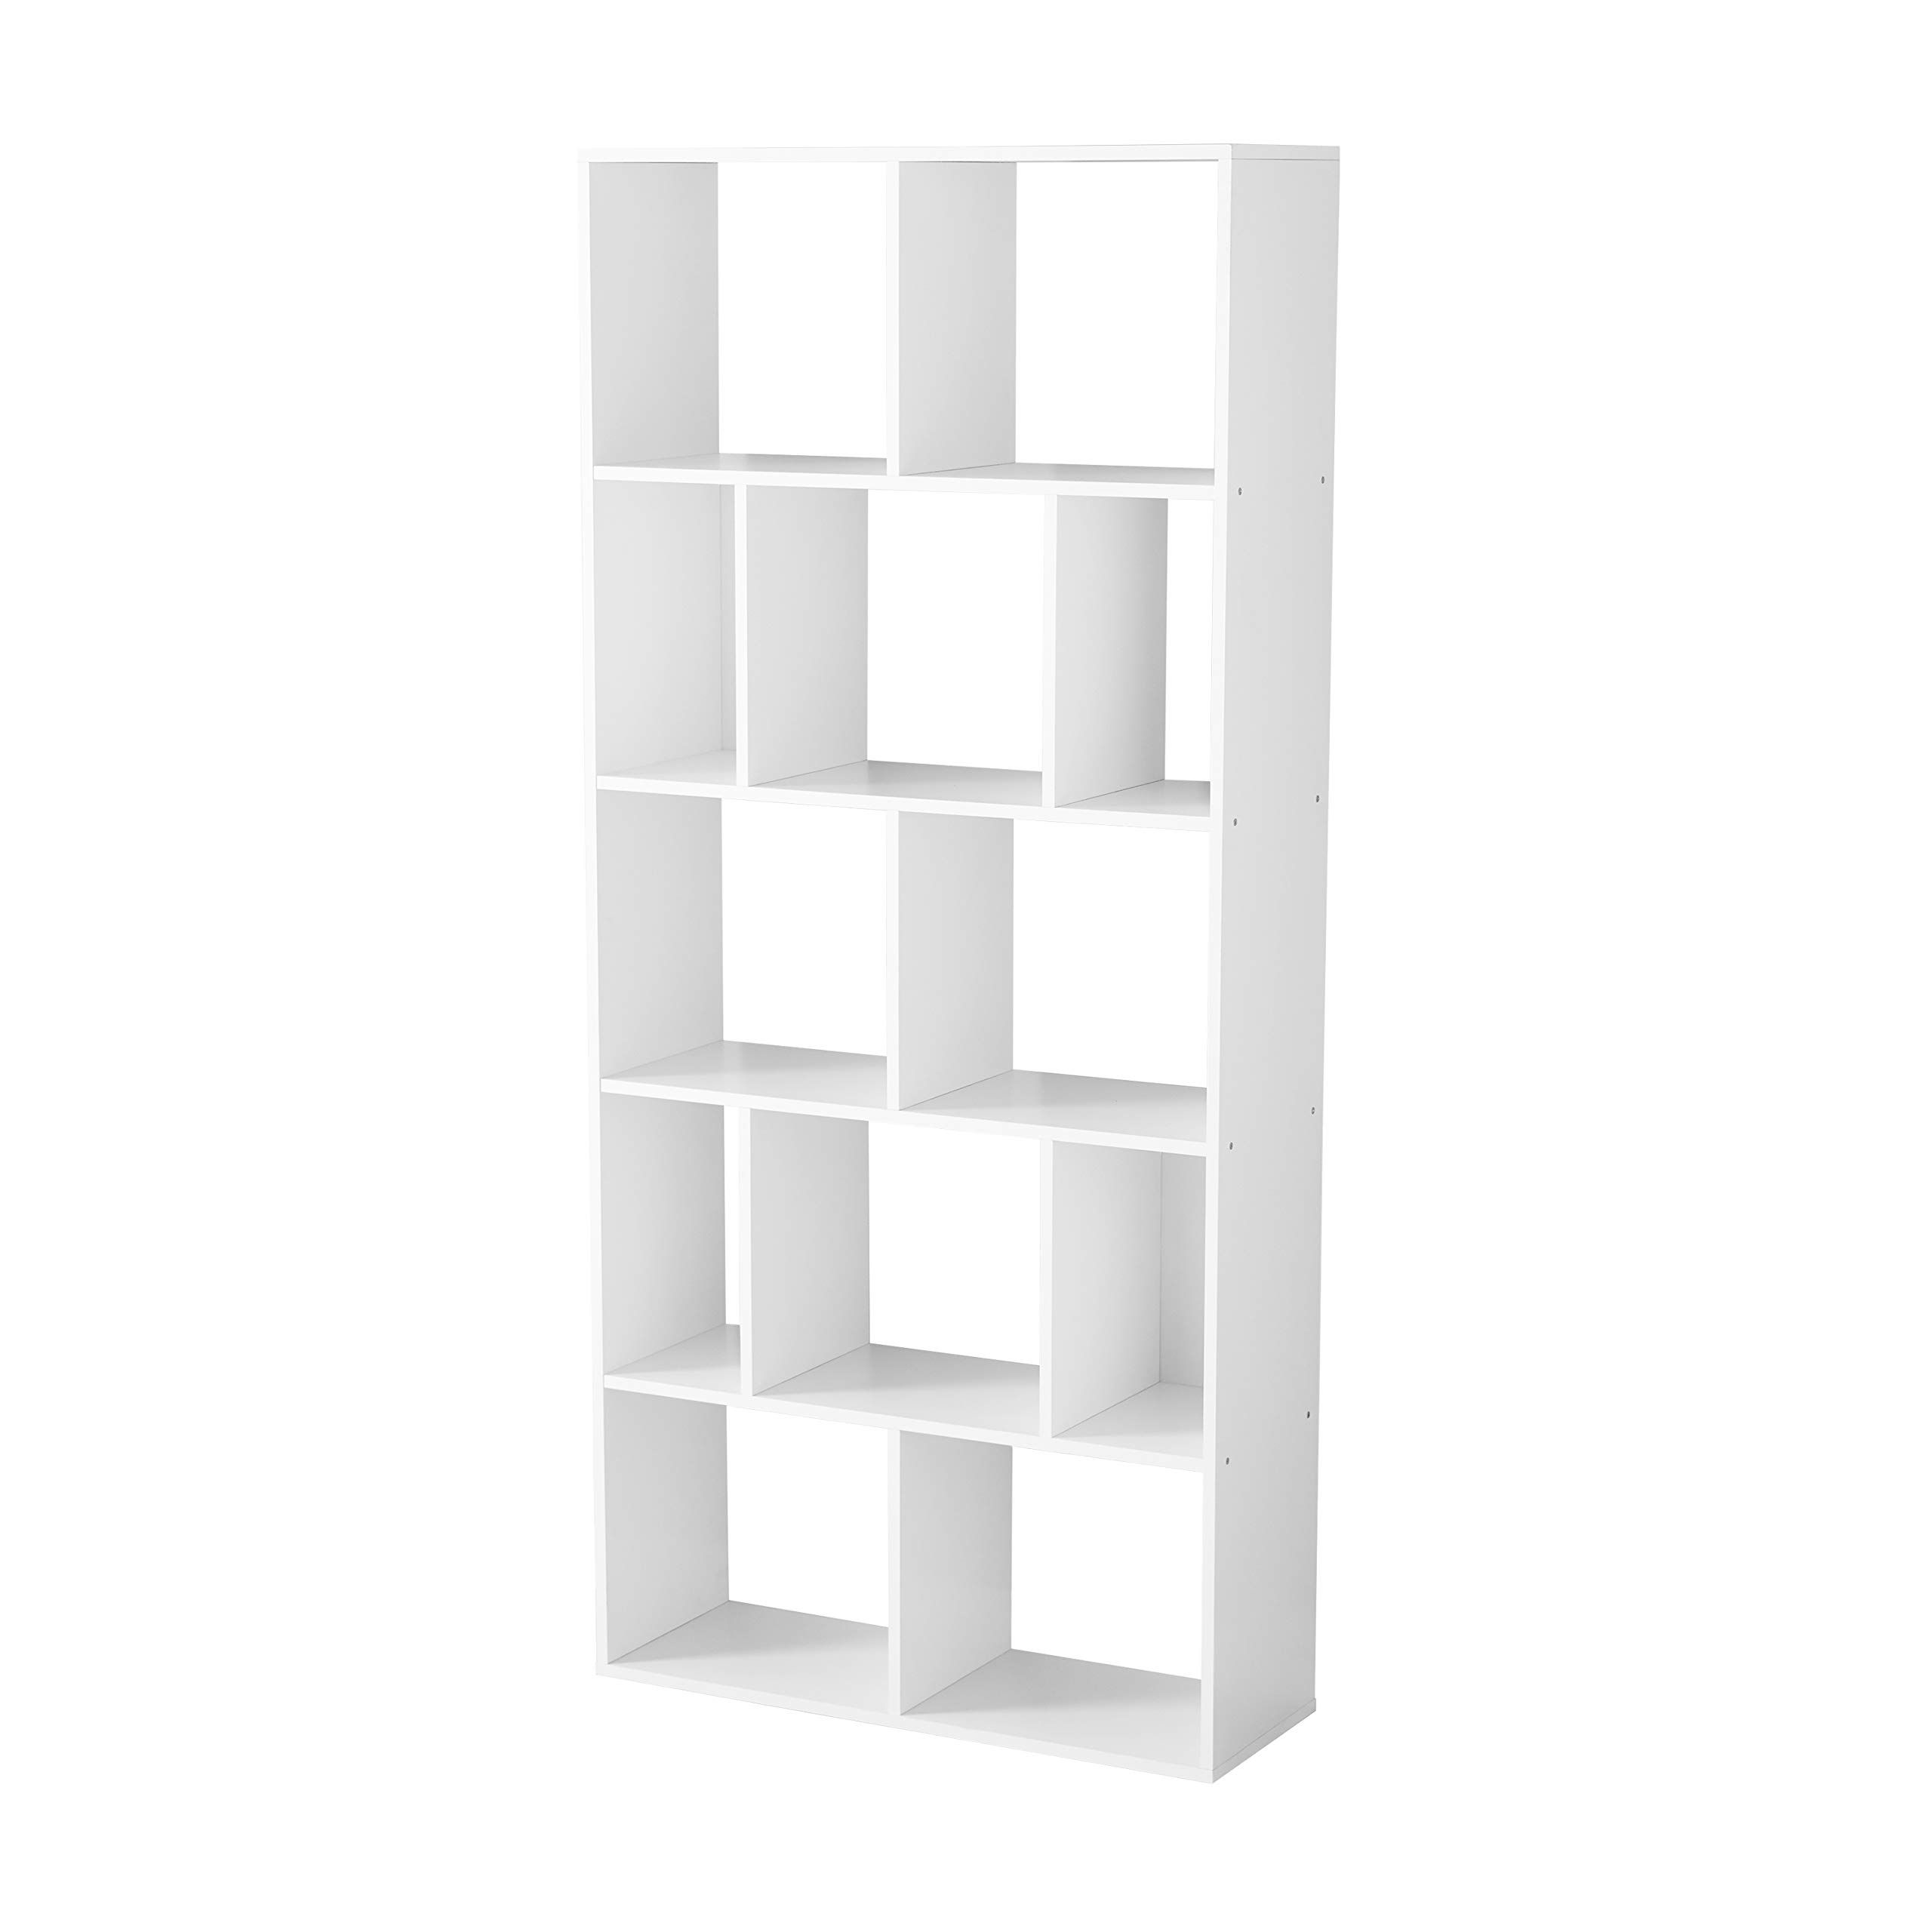 12 Cube Storage Organizer Bookcase Display Contemporary Design Wood Composite Structure 32 01 L X 11 46 W In 2020 With Images Cube Bookcase Cube Storage Bookcase Organization